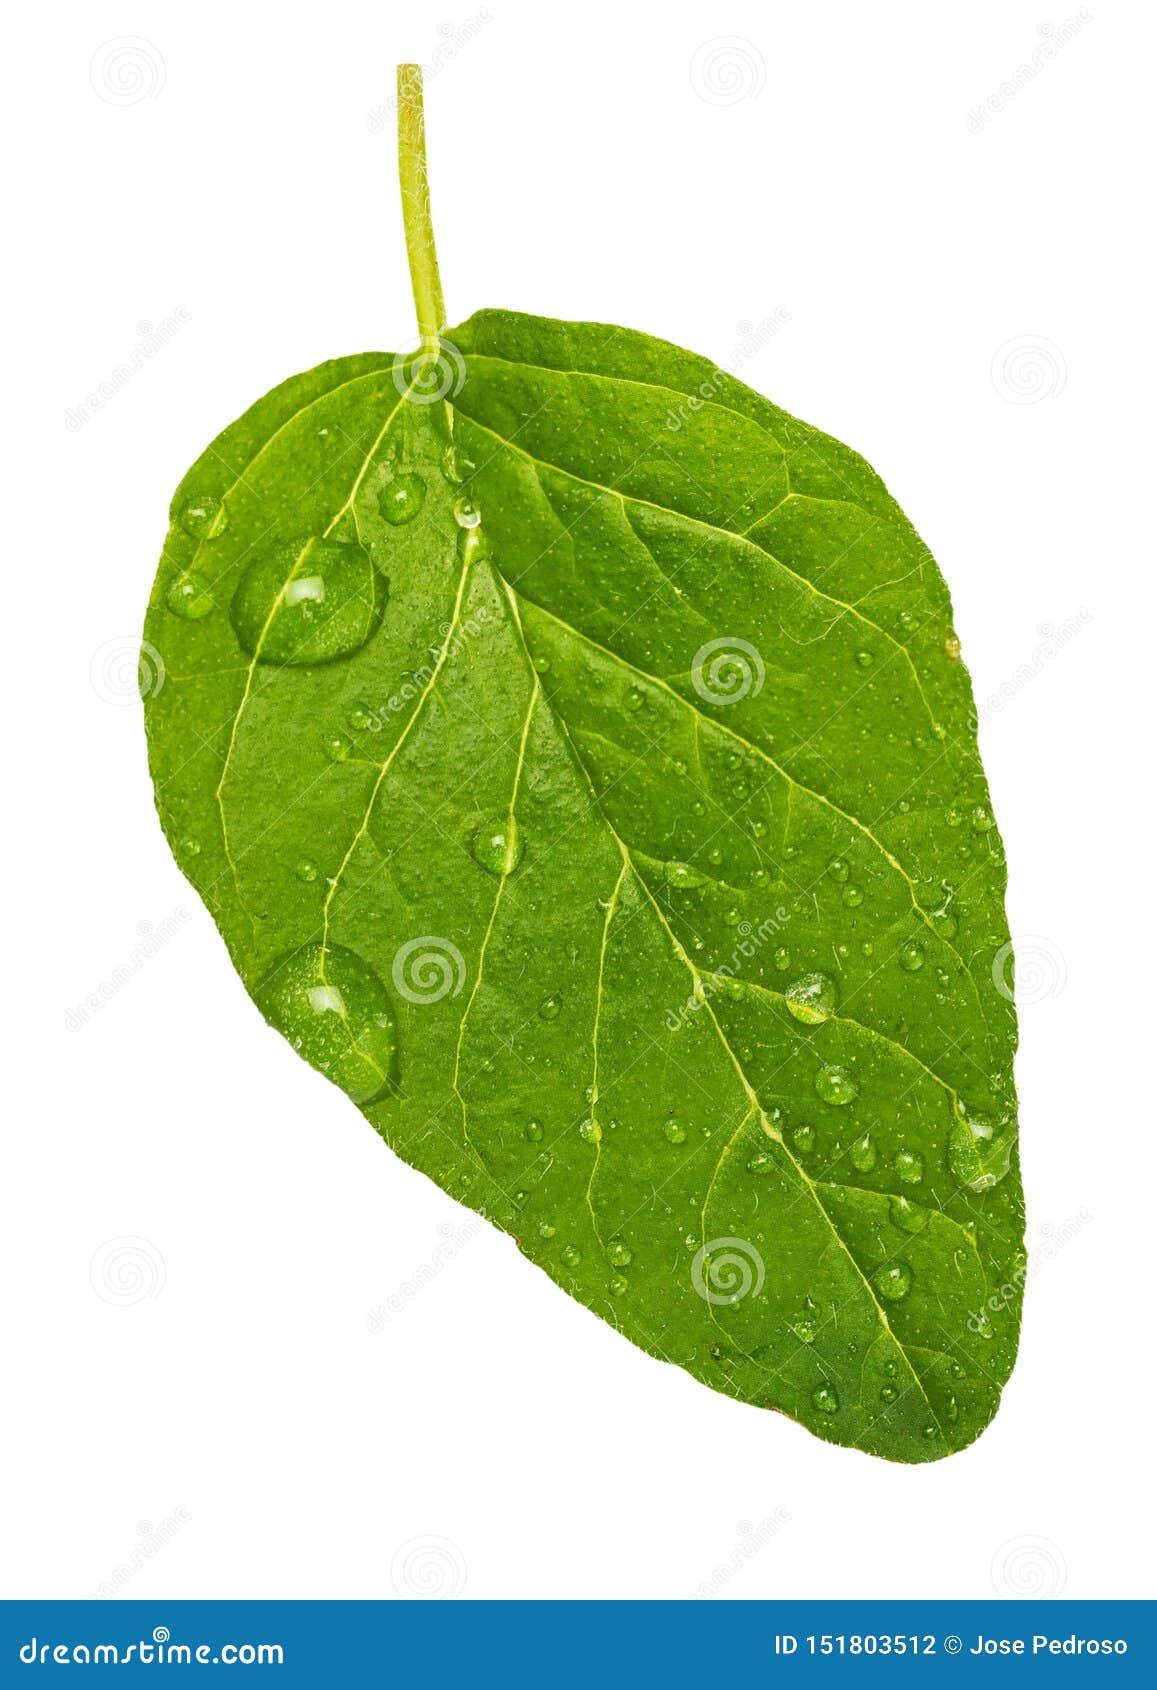 Obvers groen en vers blad van oregokruid Met micro- dalingen van water